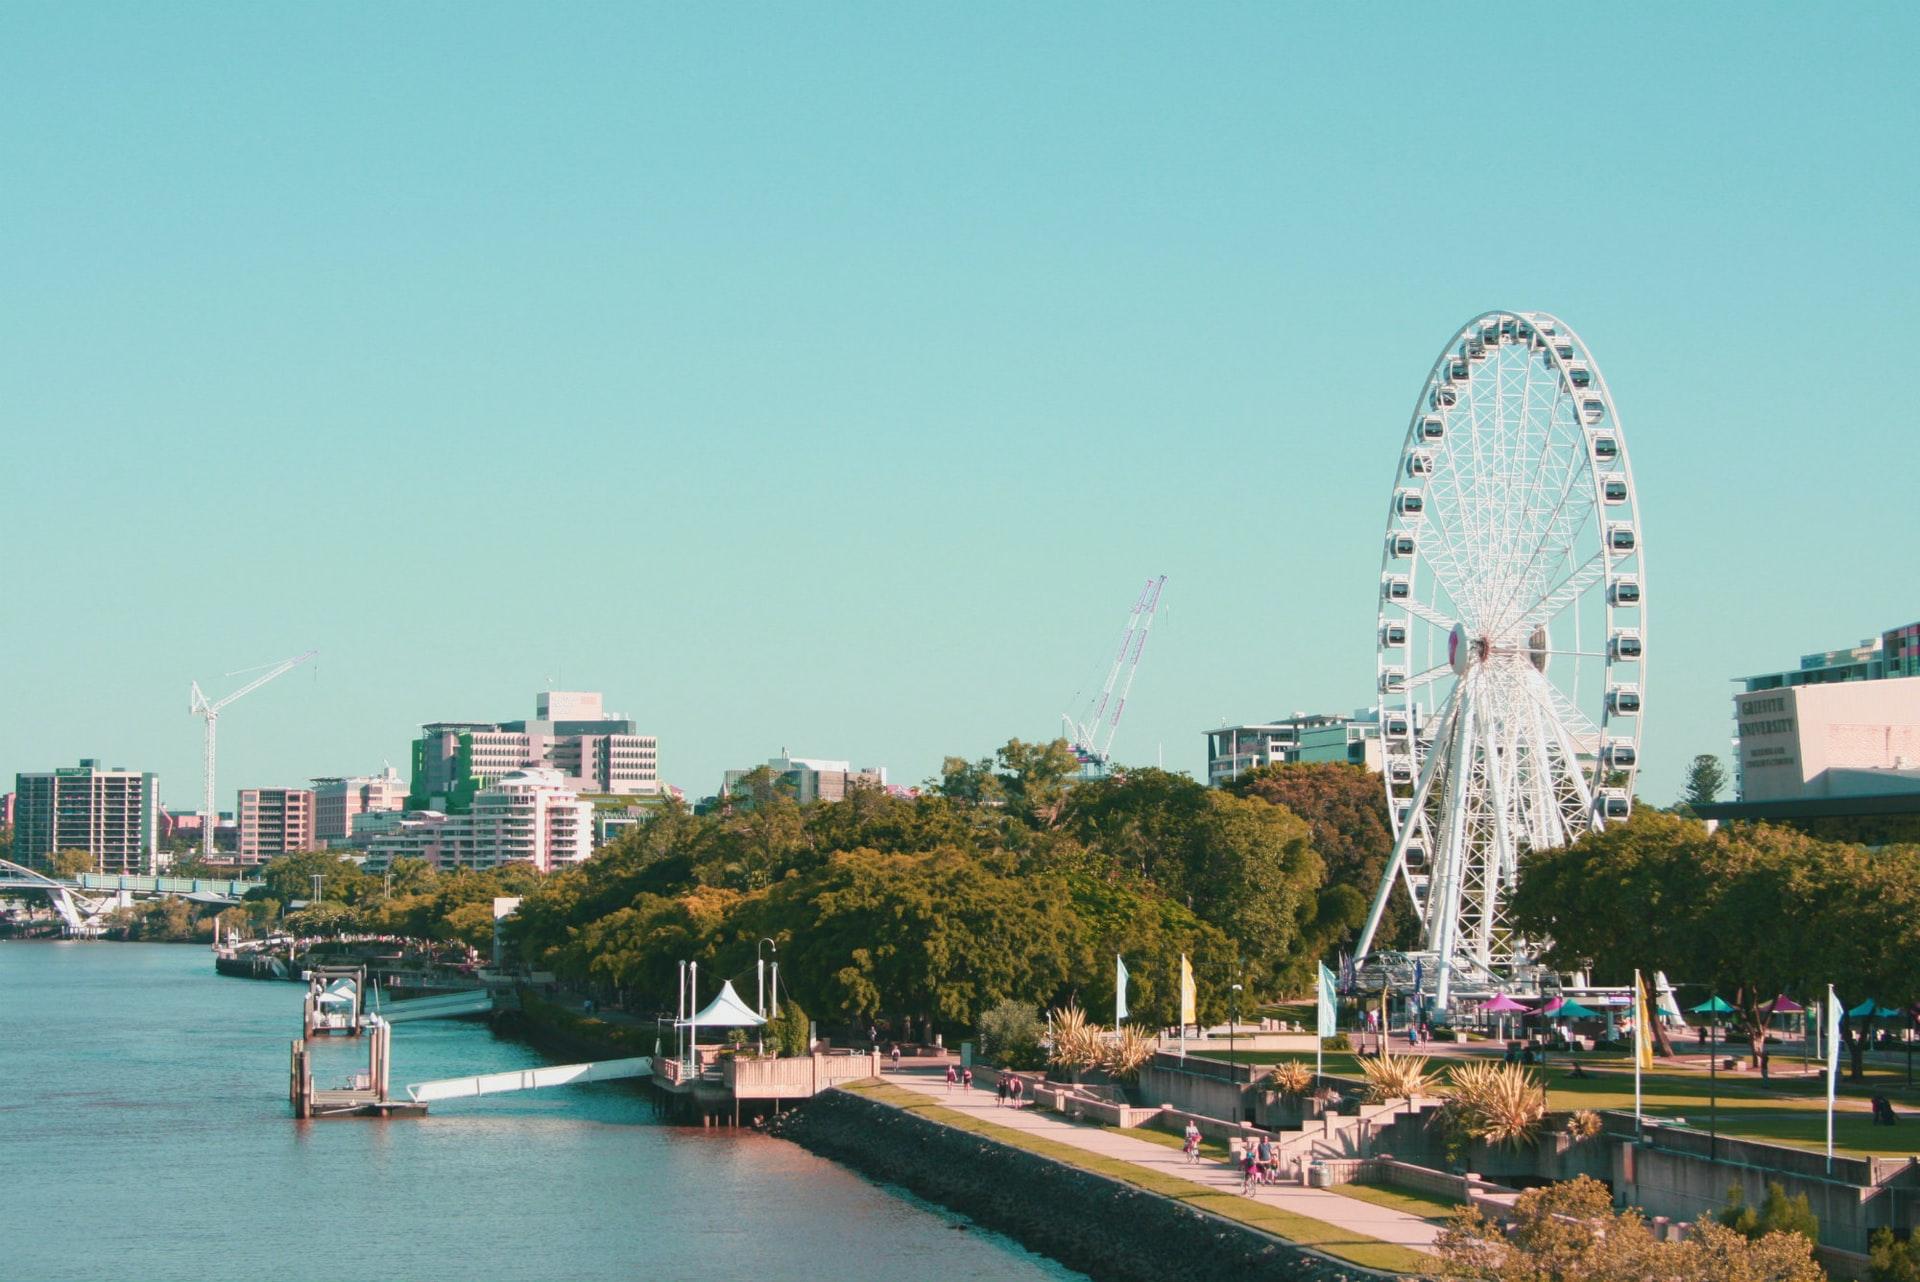 Brisbane City Ferris Wheel